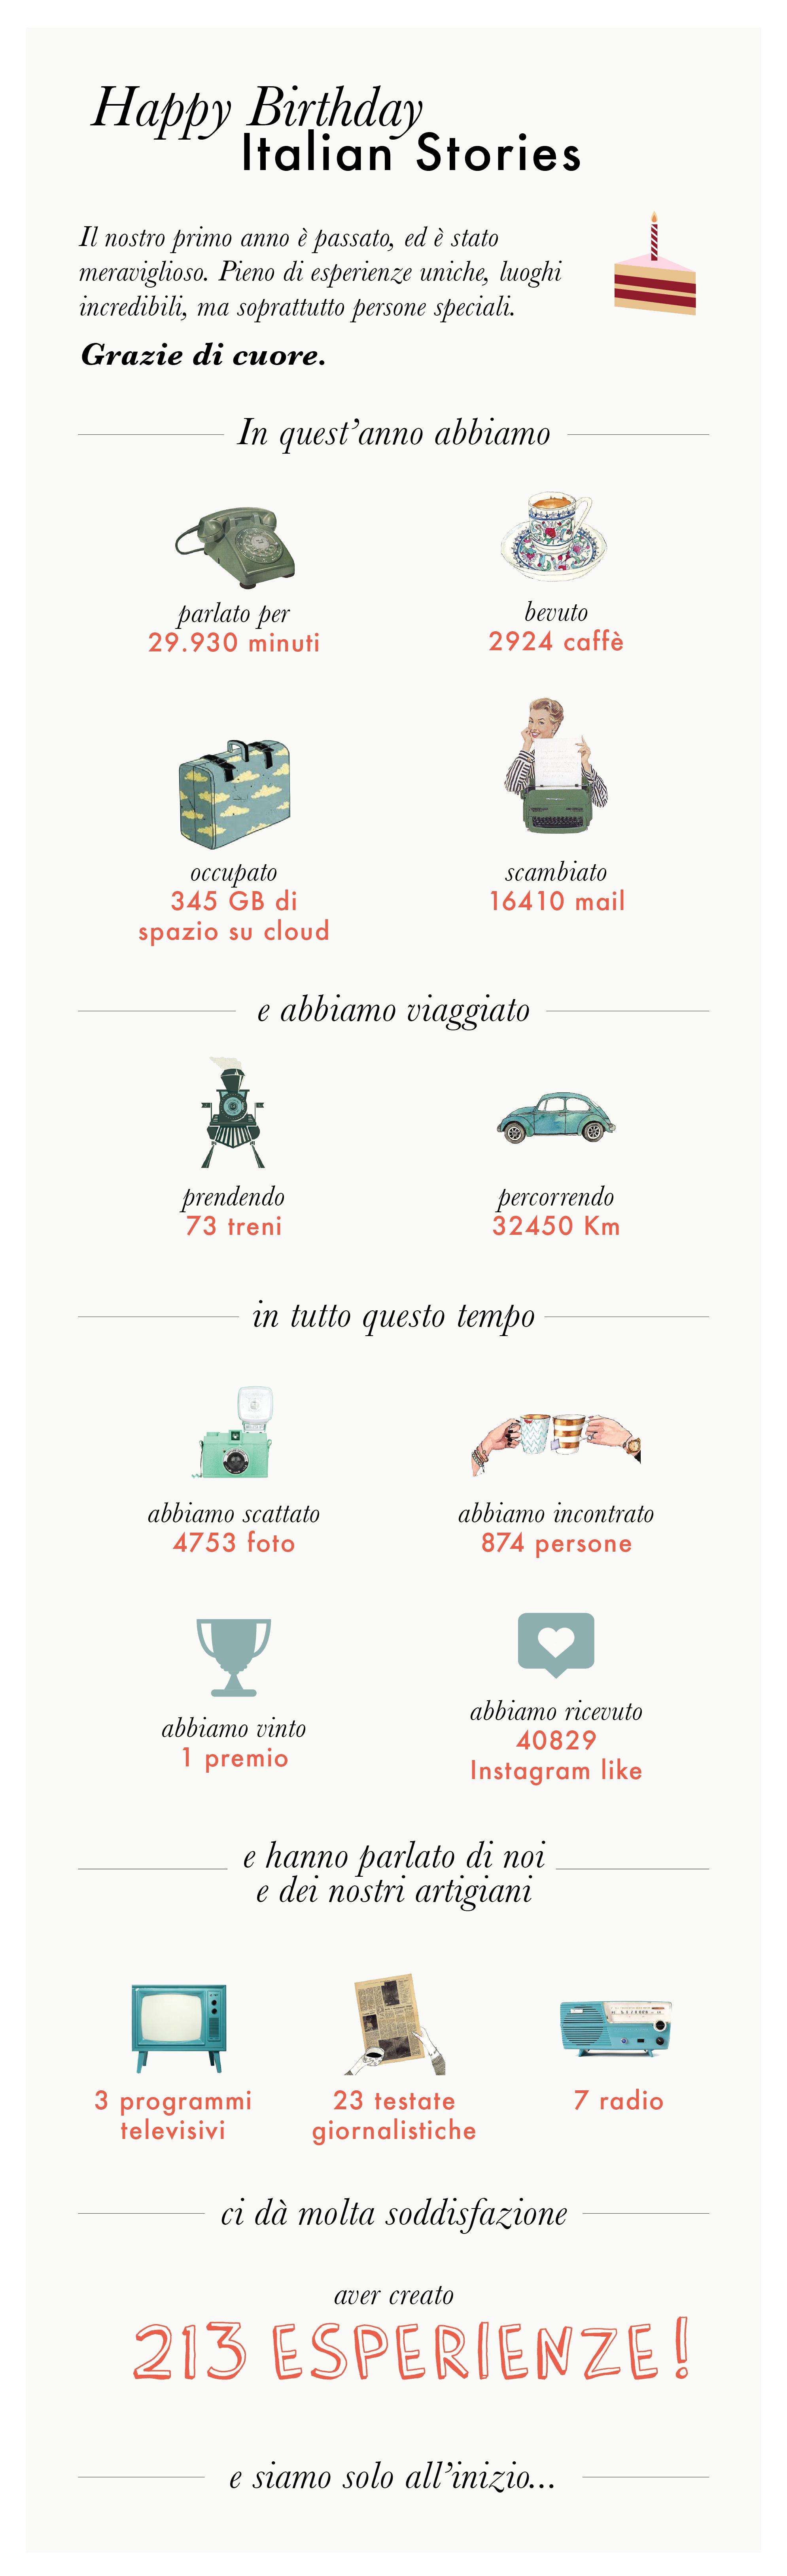 infografica_ita-01